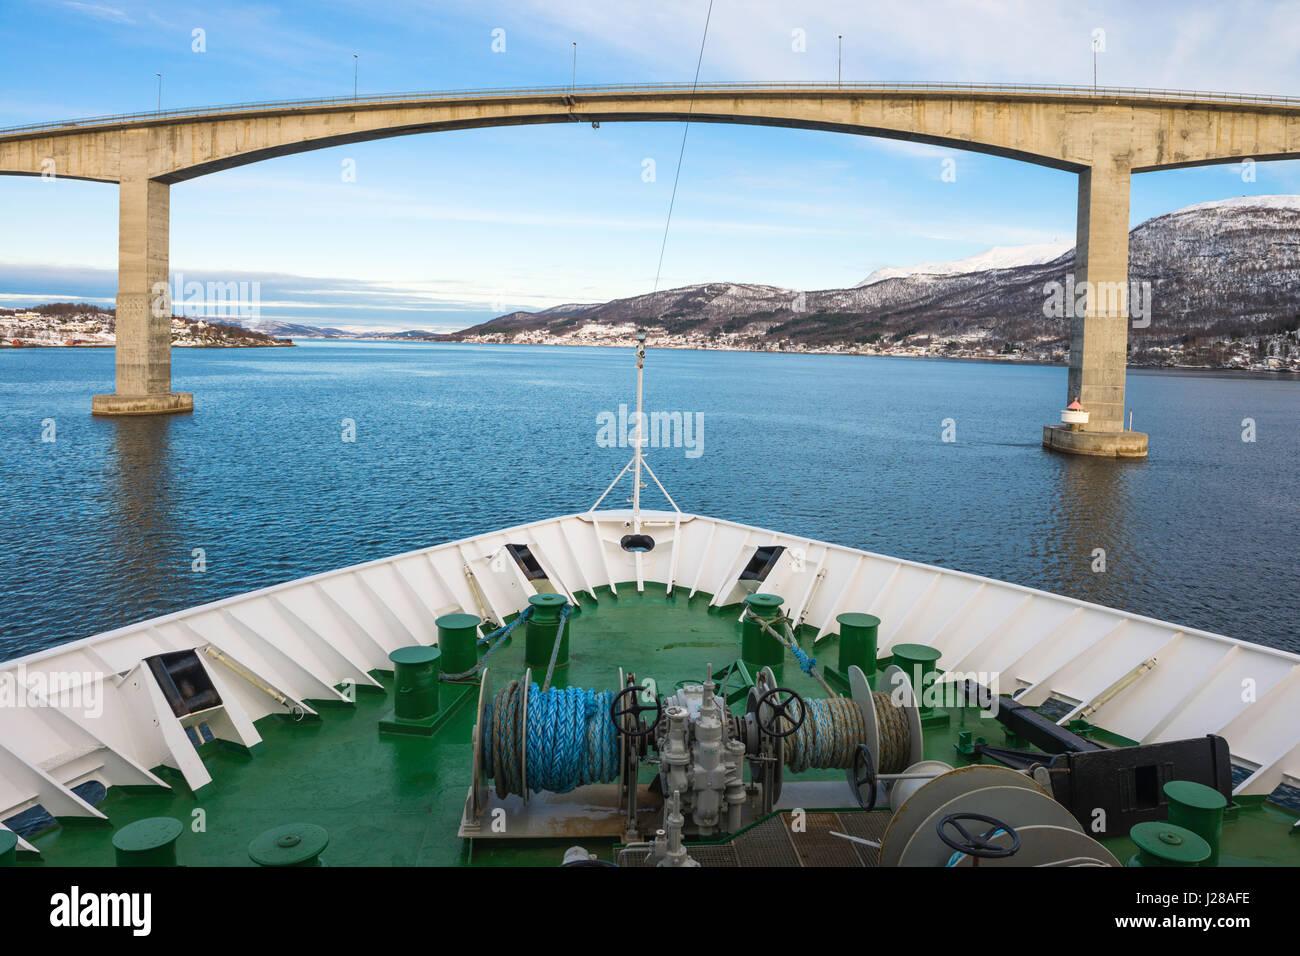 Hurtigruten Coastal Express cruise ship 'Nordnorge' approaches the Gisund bridge to Senja Island at Finnsnes, - Stock Image